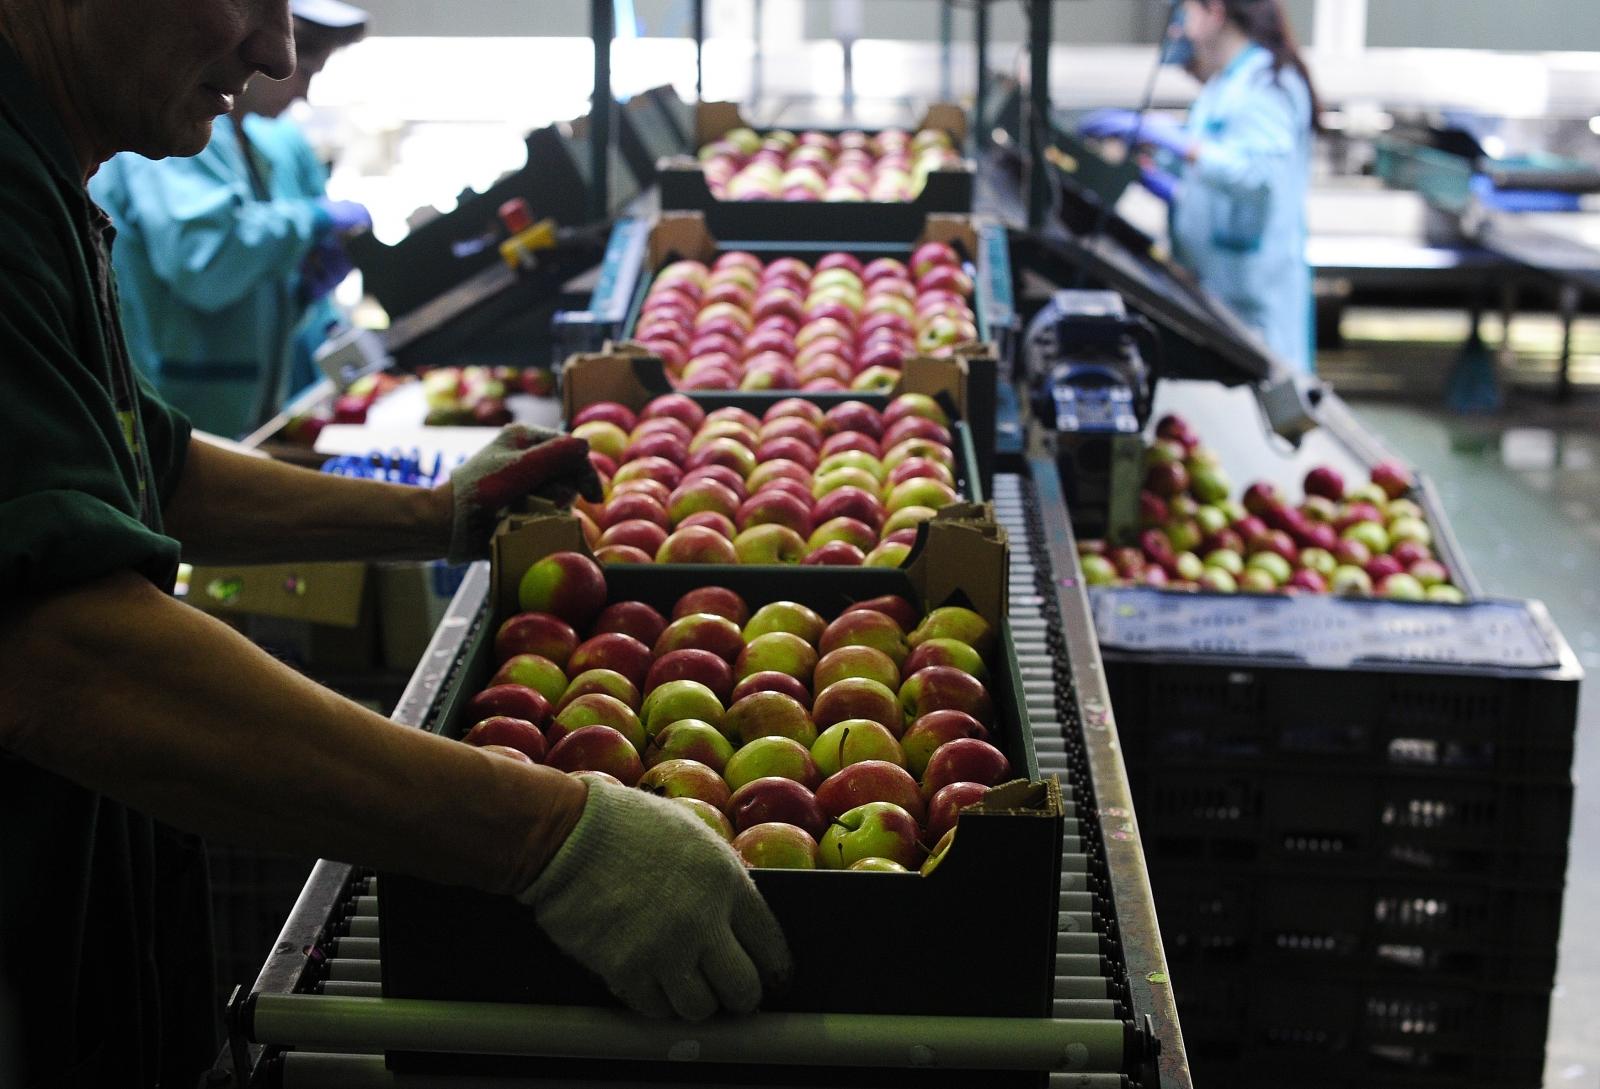 Poland's apples